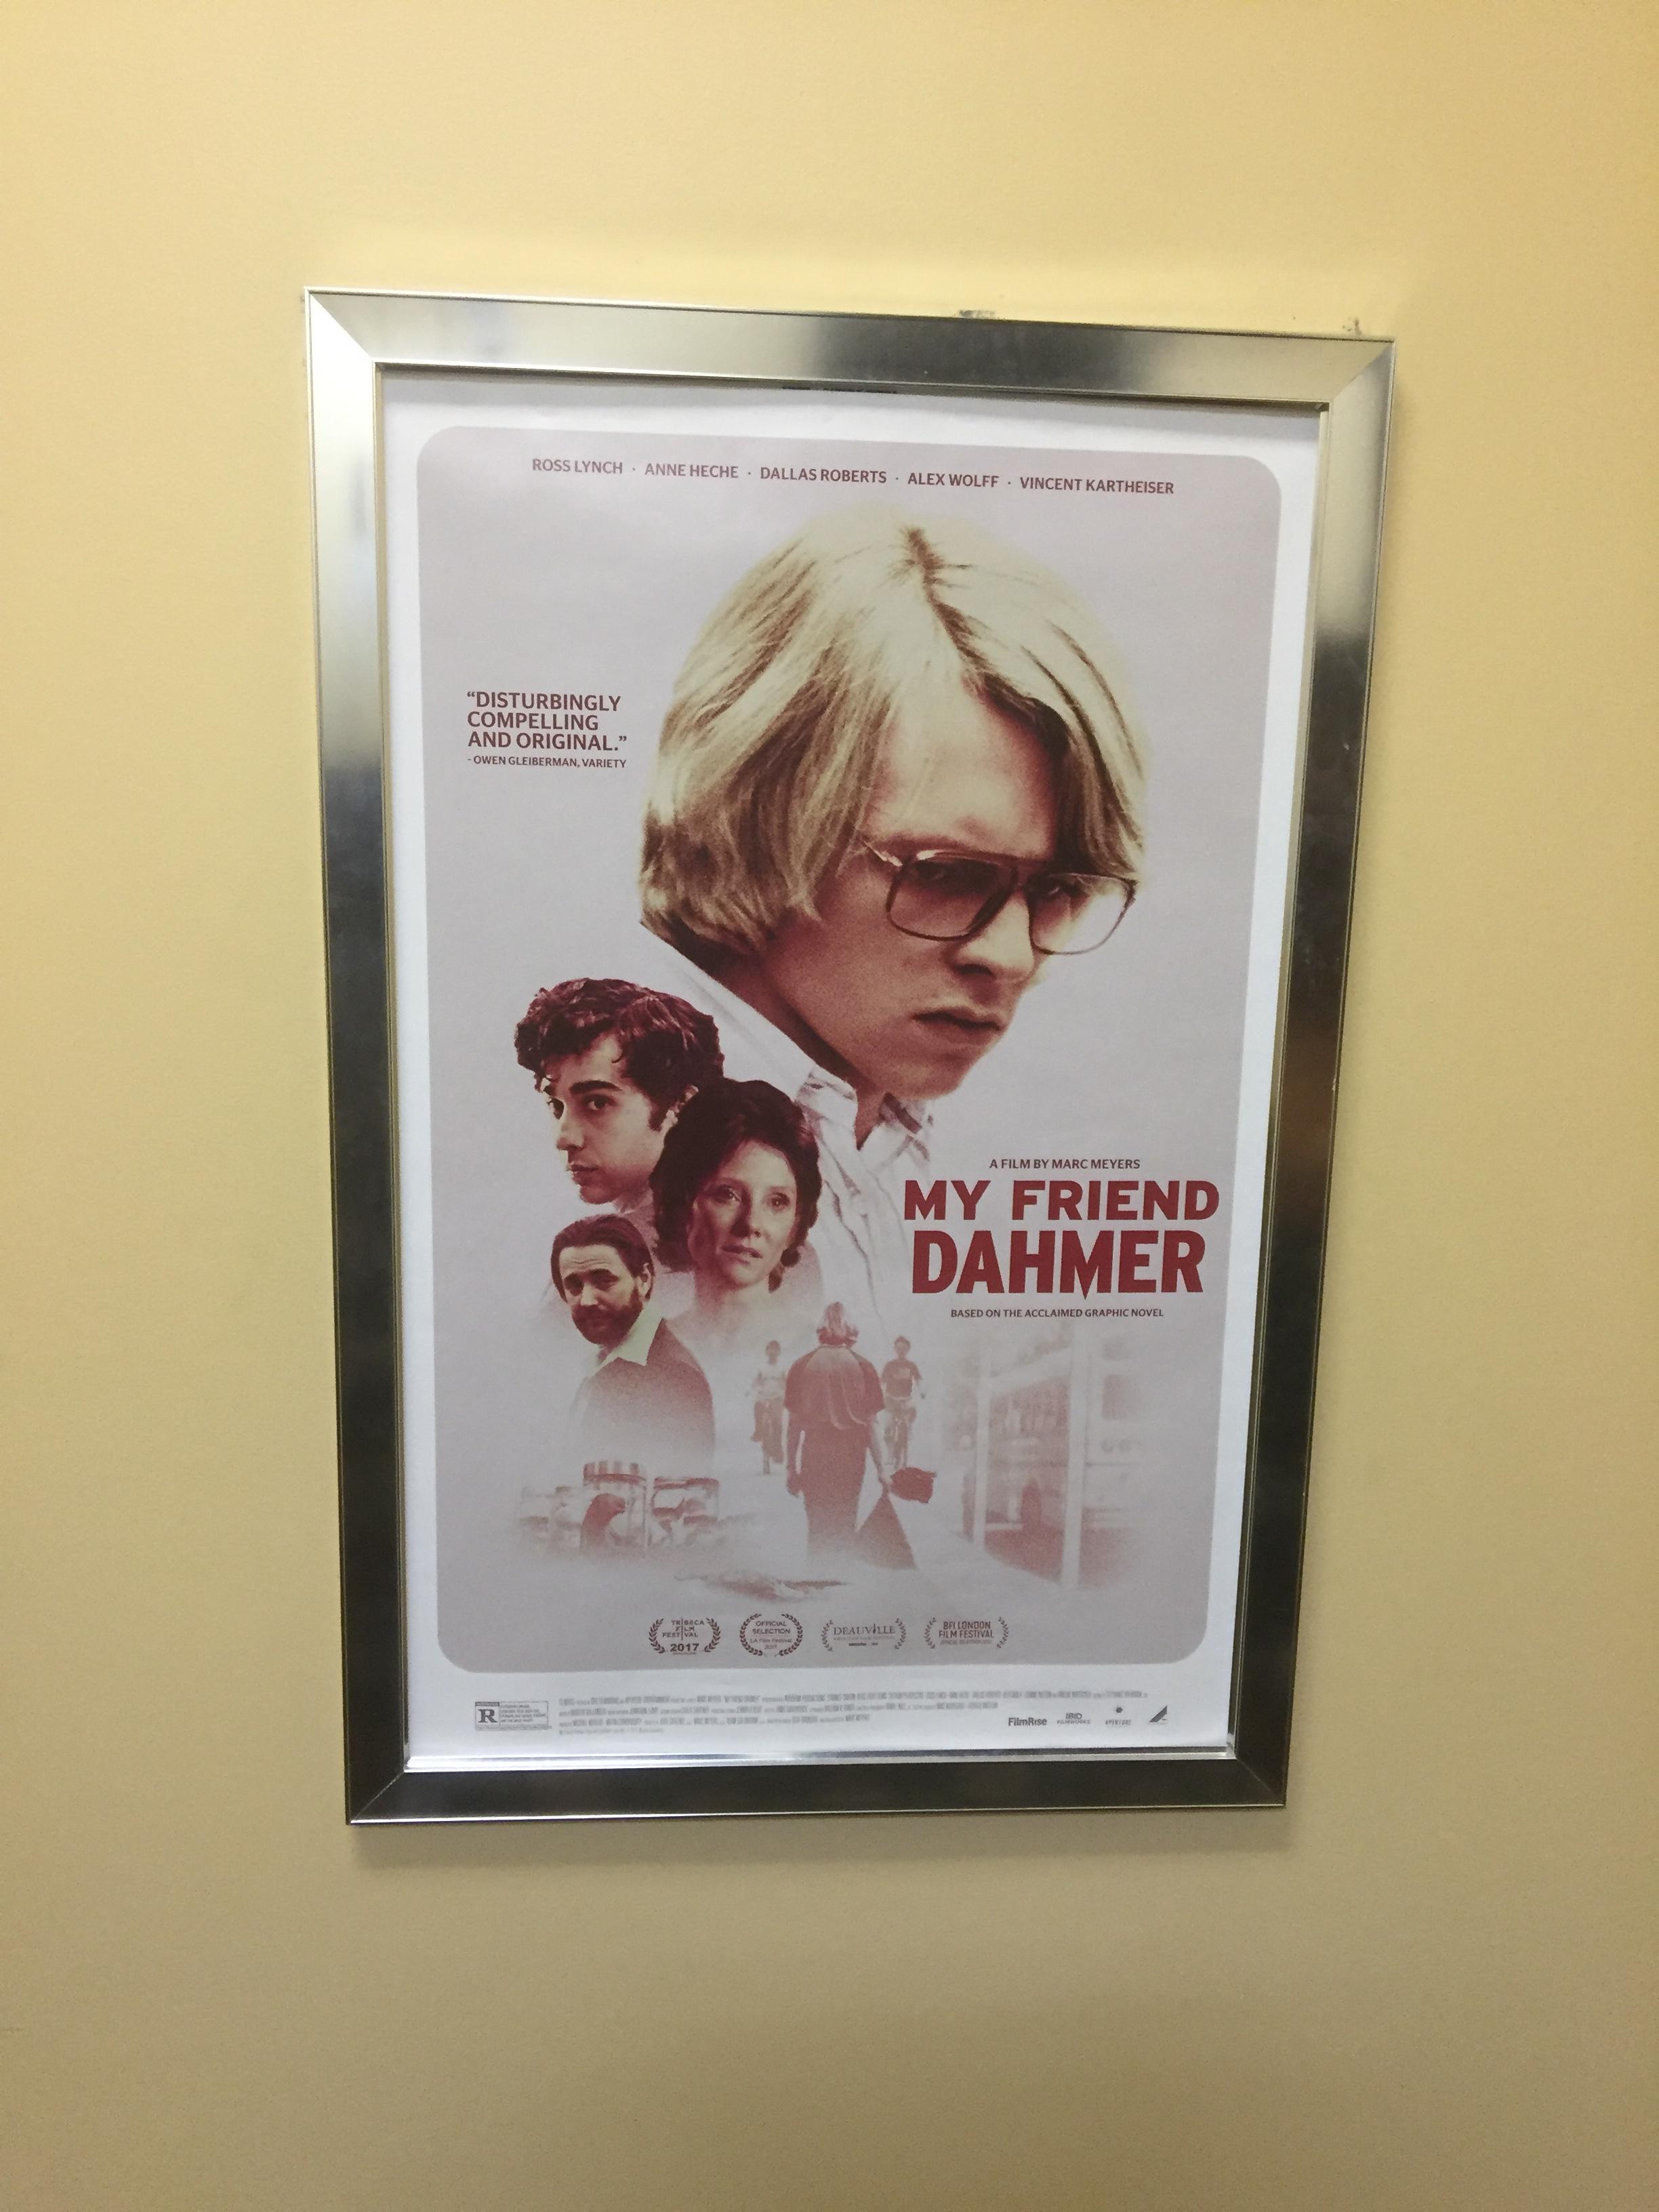 Dahmer Poster.JPG